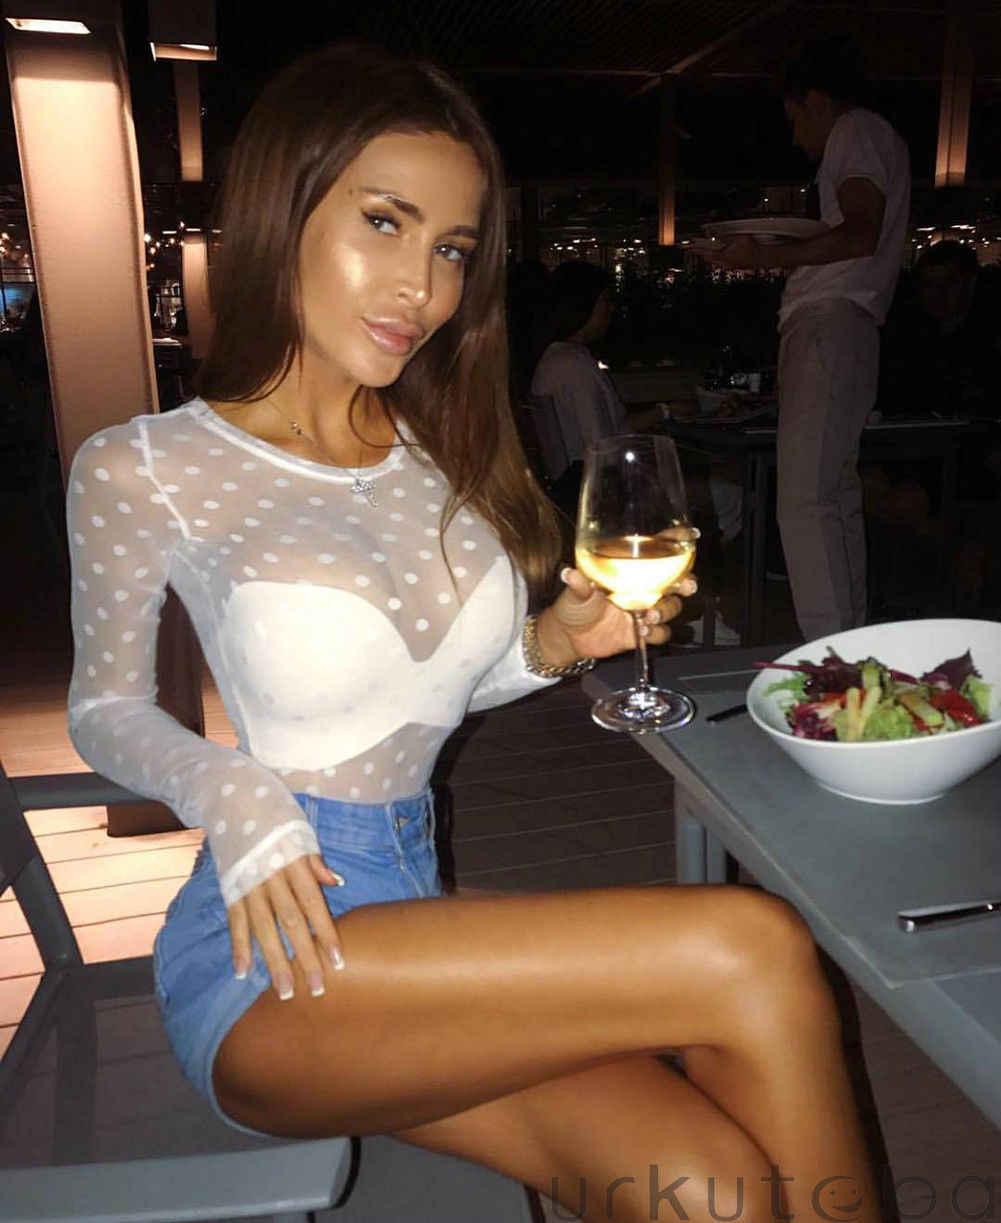 Mode Mesh Blouse Lange Mouw vrouwen Polka Dot Crew Hals Womens Tops En Blouses Sexy Sheer Shirt Hot